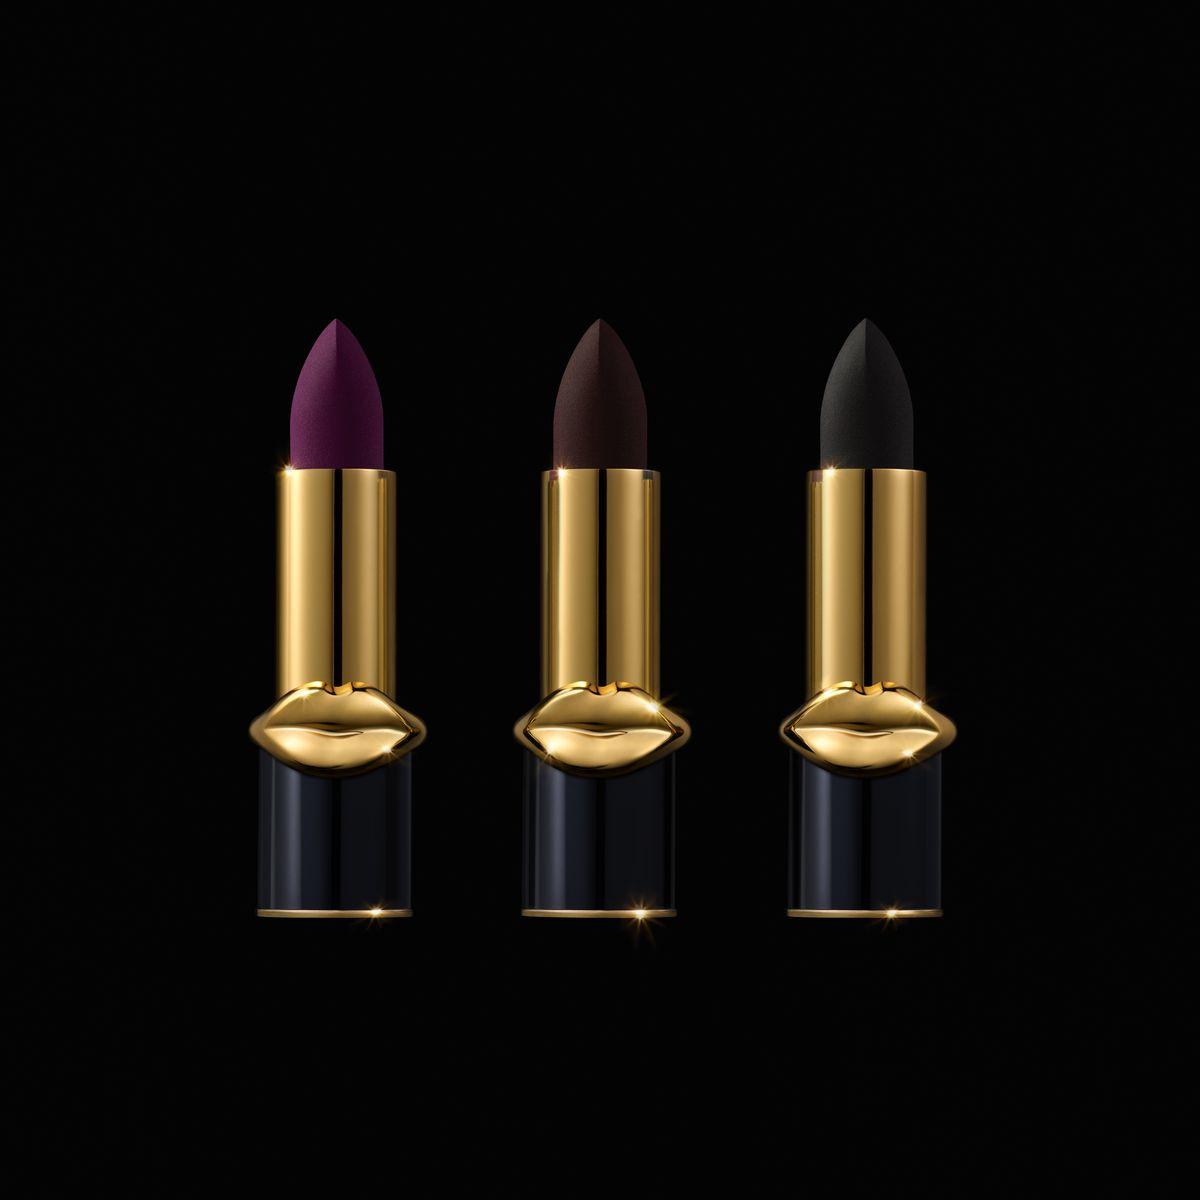 3 dark lipsticks